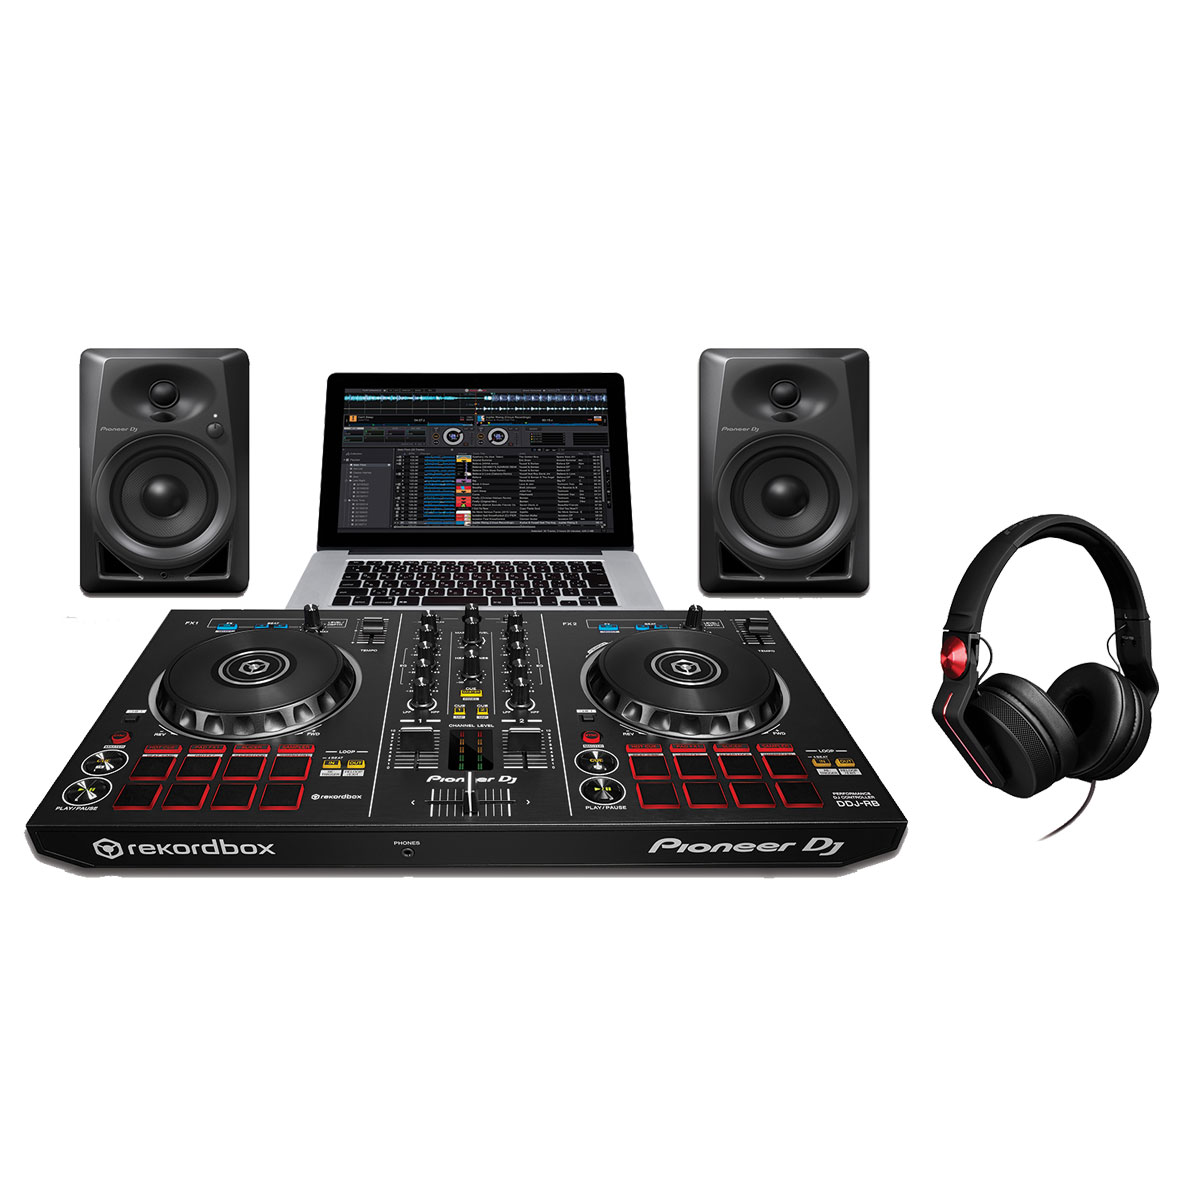 pioneer dj starter pack music trends pro audio lighting and production equipment. Black Bedroom Furniture Sets. Home Design Ideas